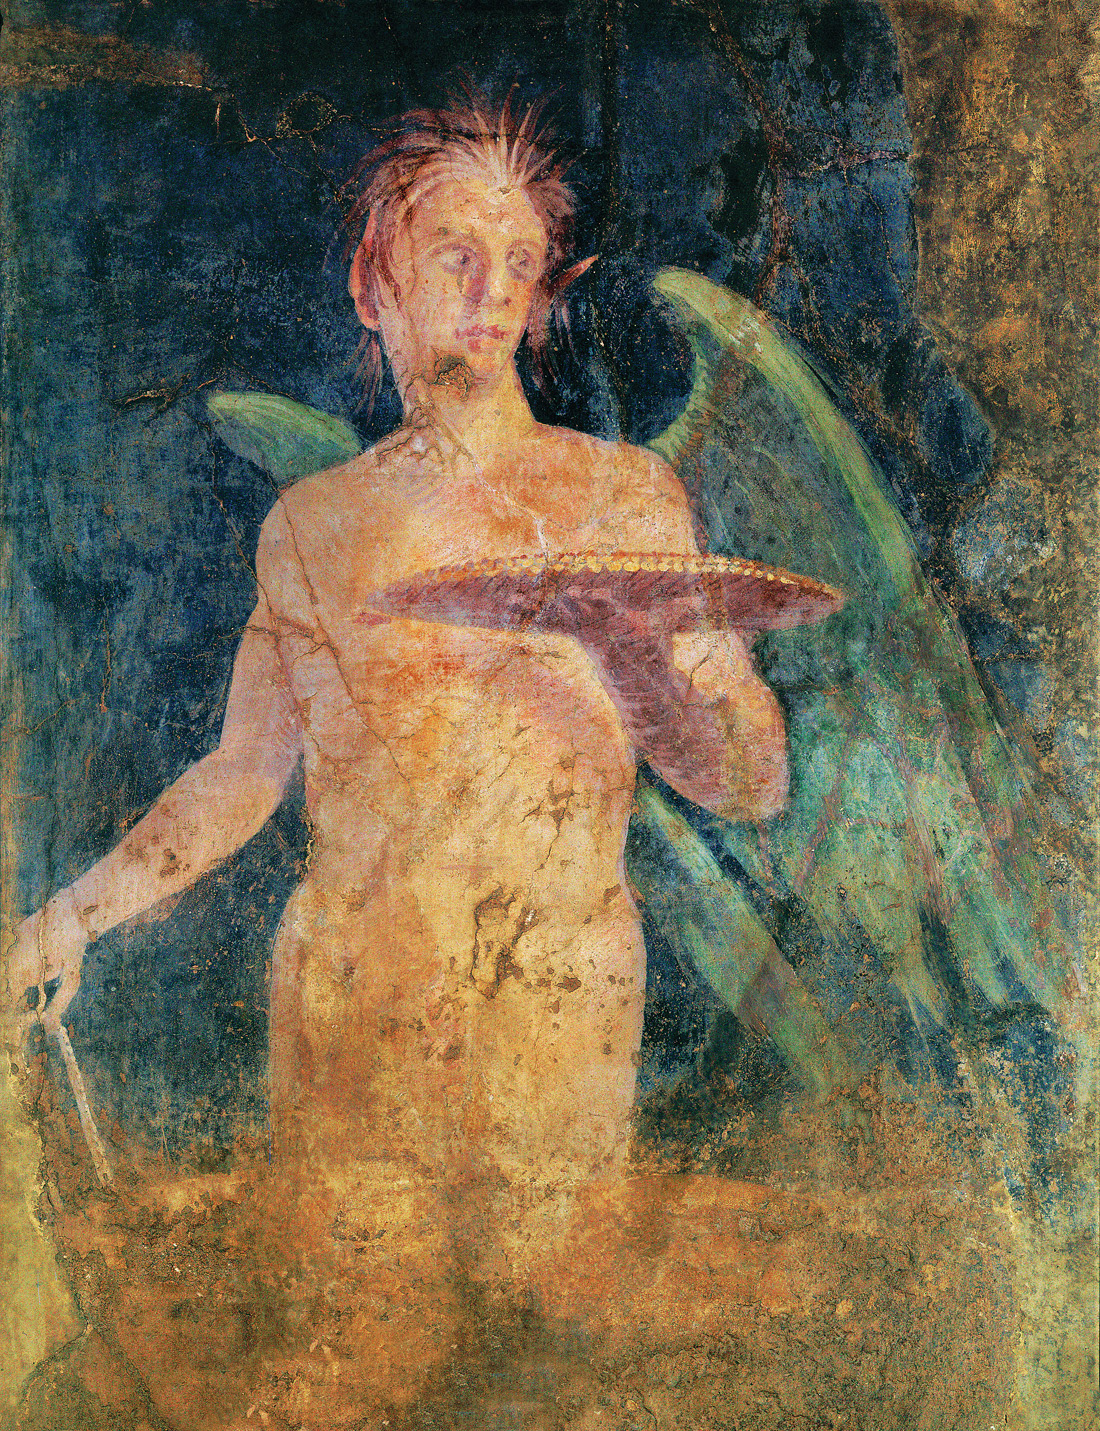 Winged Genius, fresco in Boscoreale, Italy, first century BC. Louvre Museum, Paris, France.